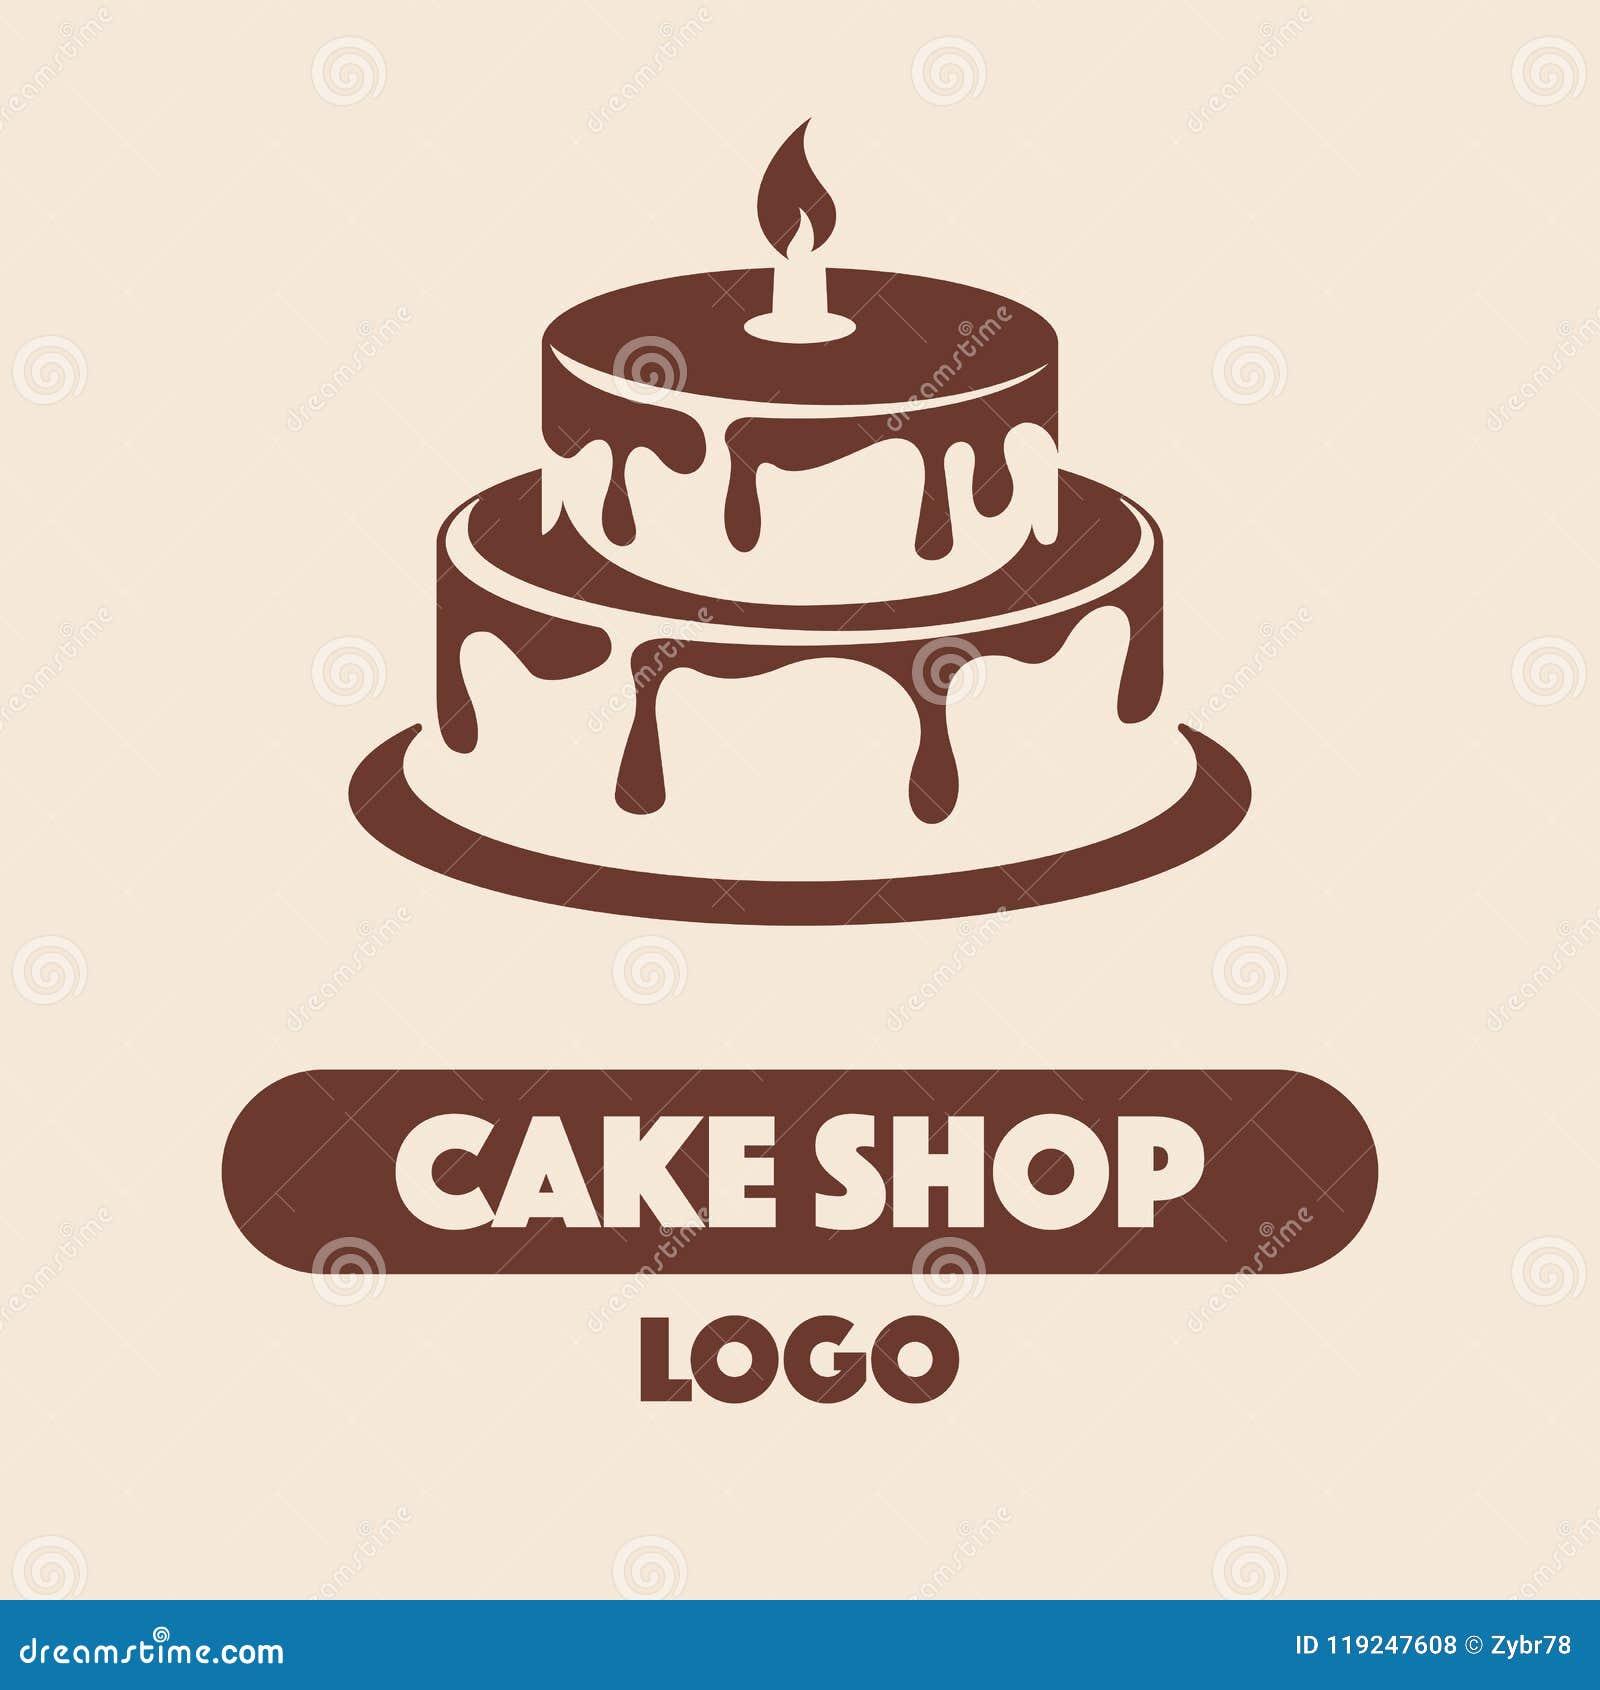 Logo Cake Shop Stock Vector Illustration Of Design 119247608